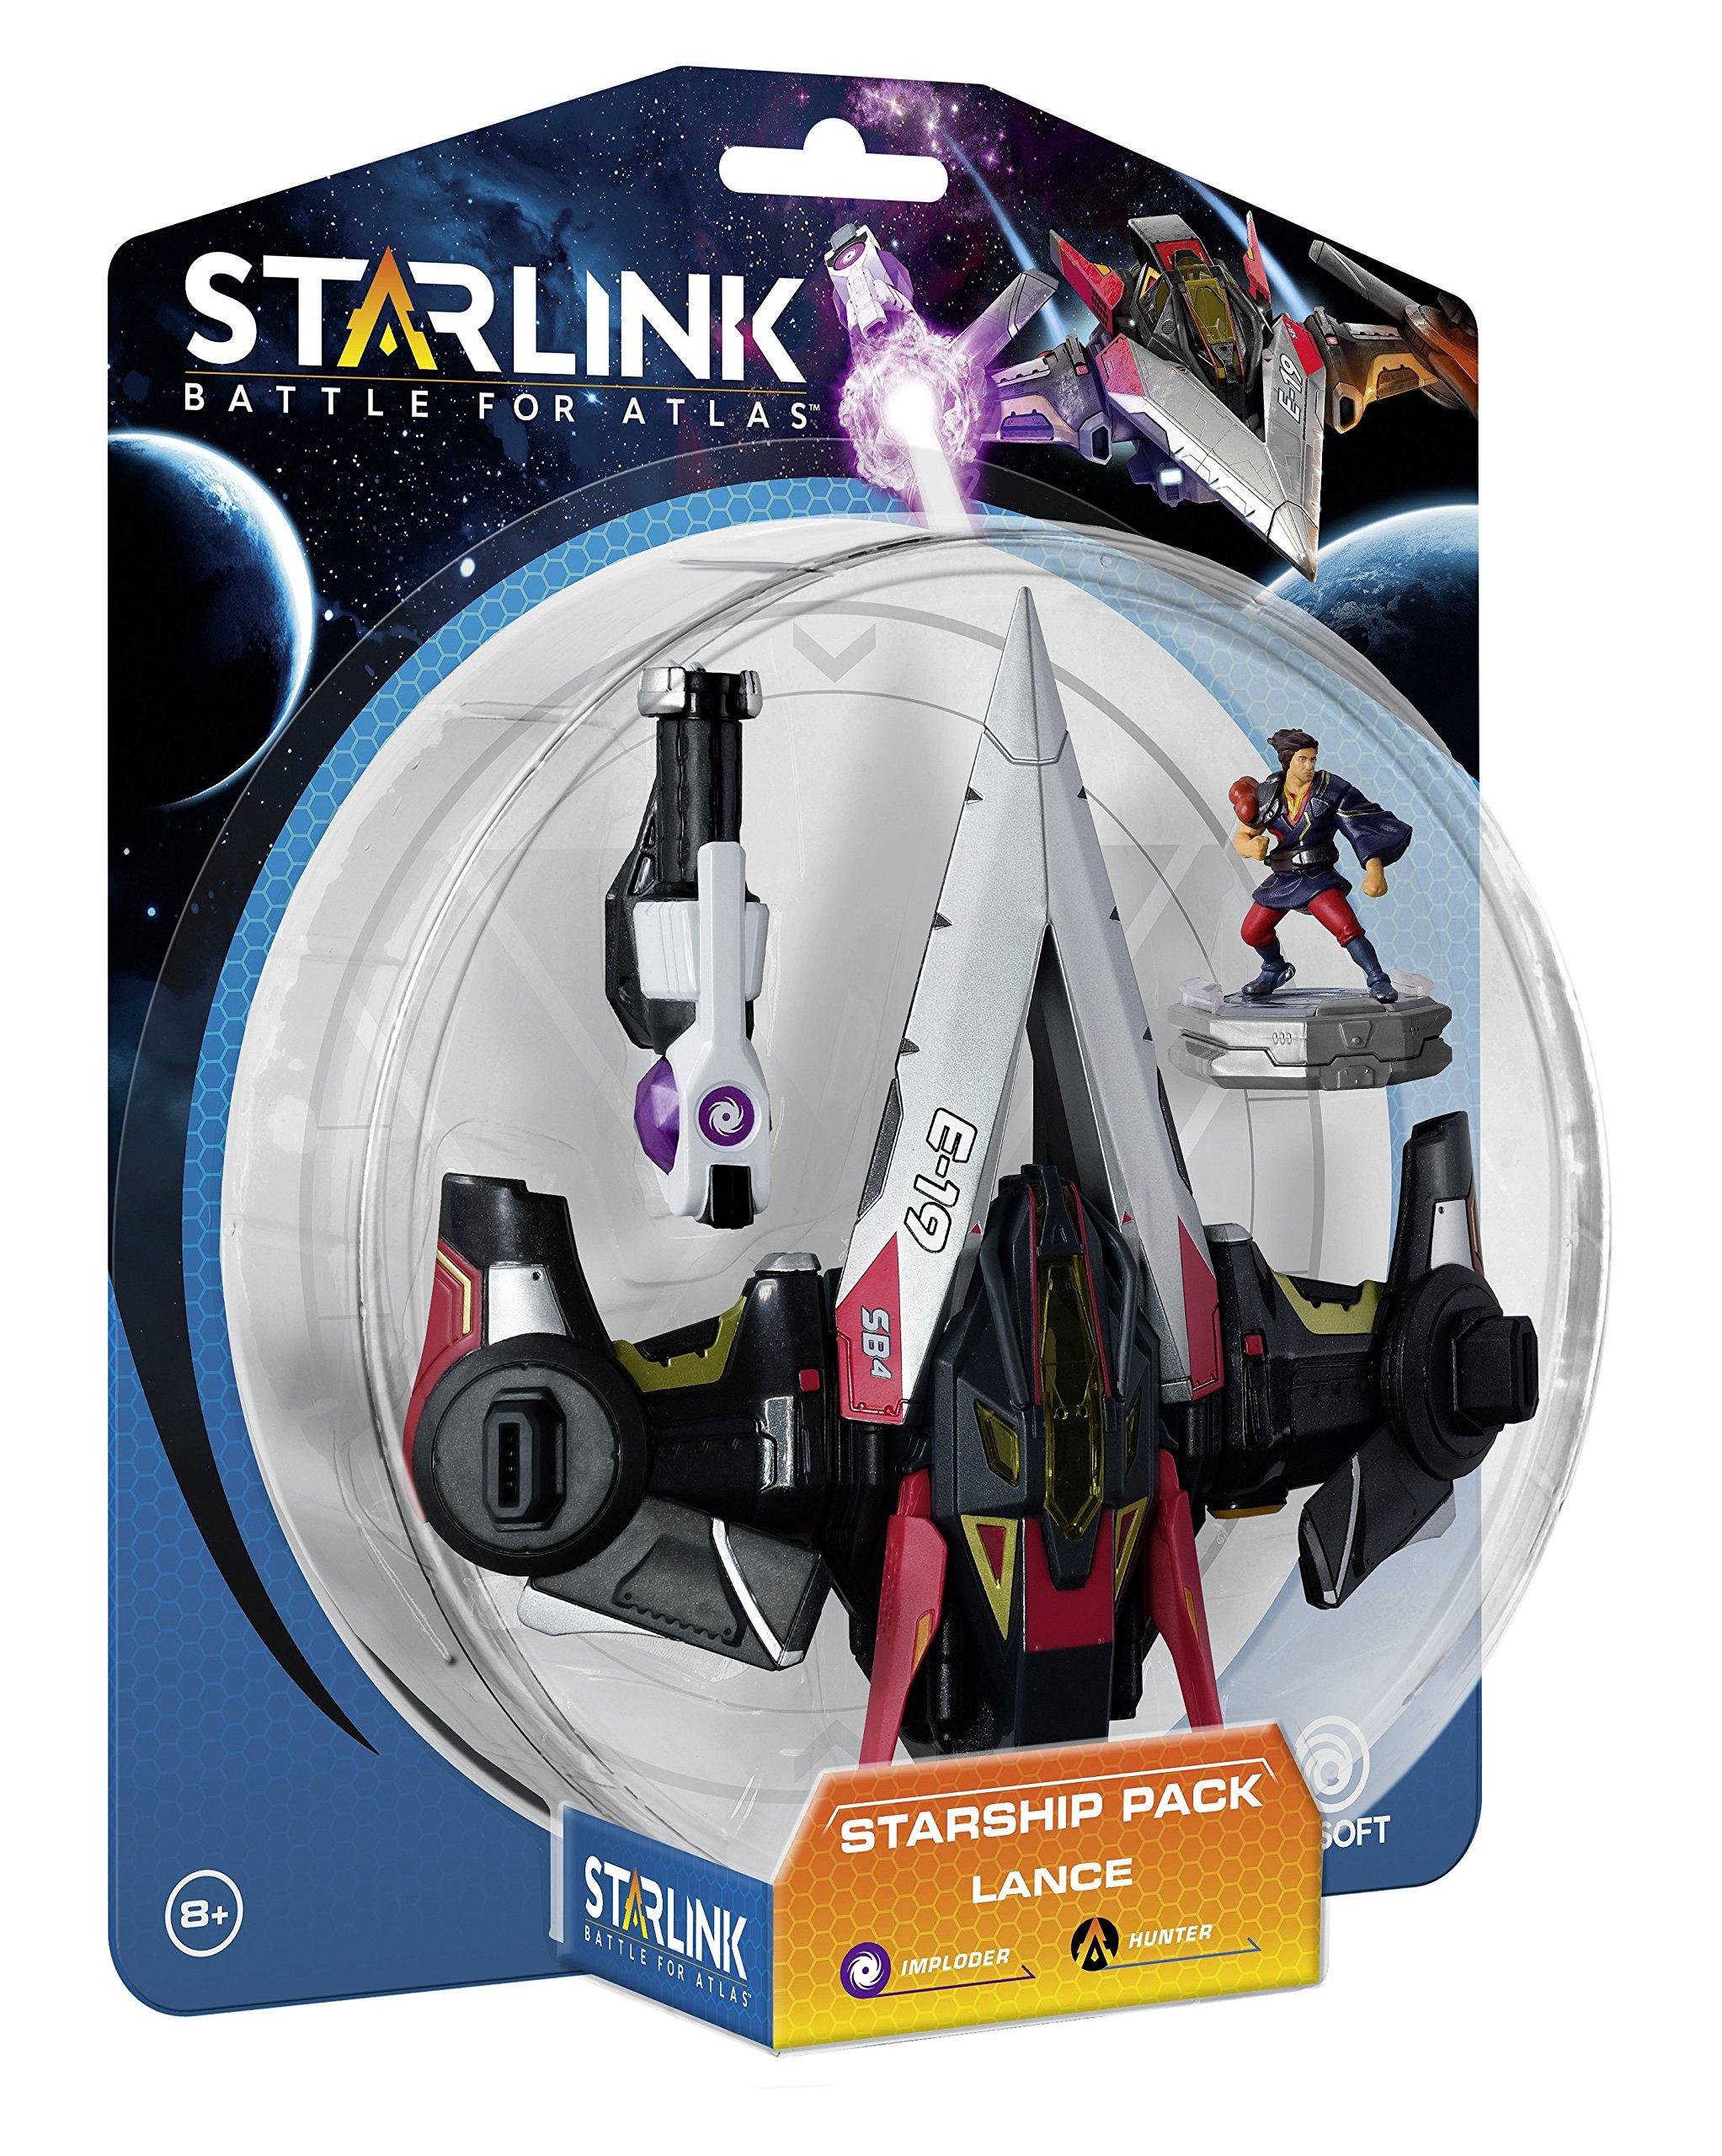 Starlink - Battle For Atlas, Pack De Armas Crusher + Shredder & Pack Nave Lance: Amazon.es: Videojuegos